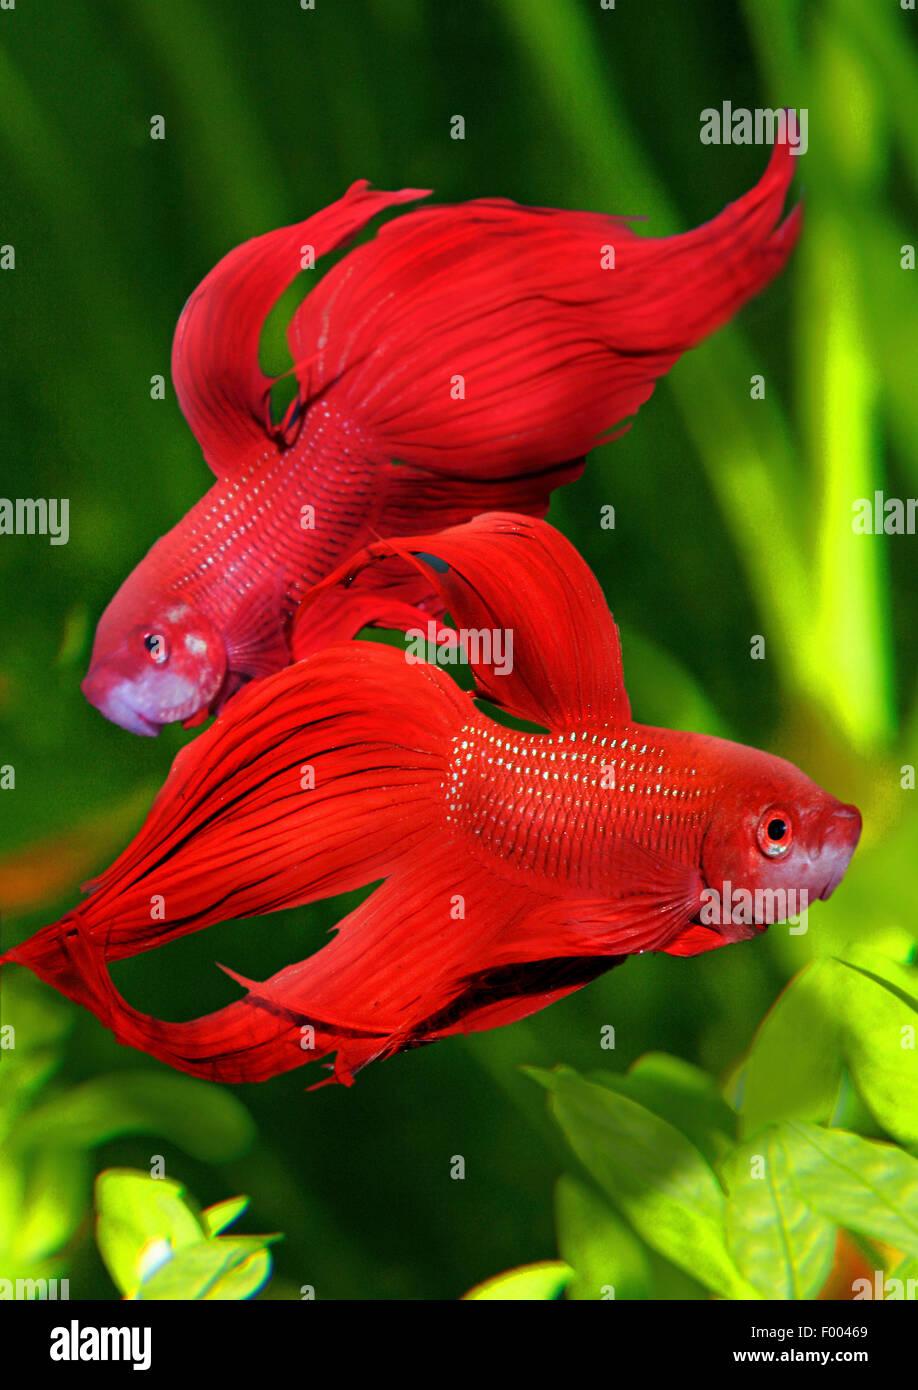 Siamese fighting fish, Siamese fighter (Betta splendens), two Siamese fighting fishes - Stock Image